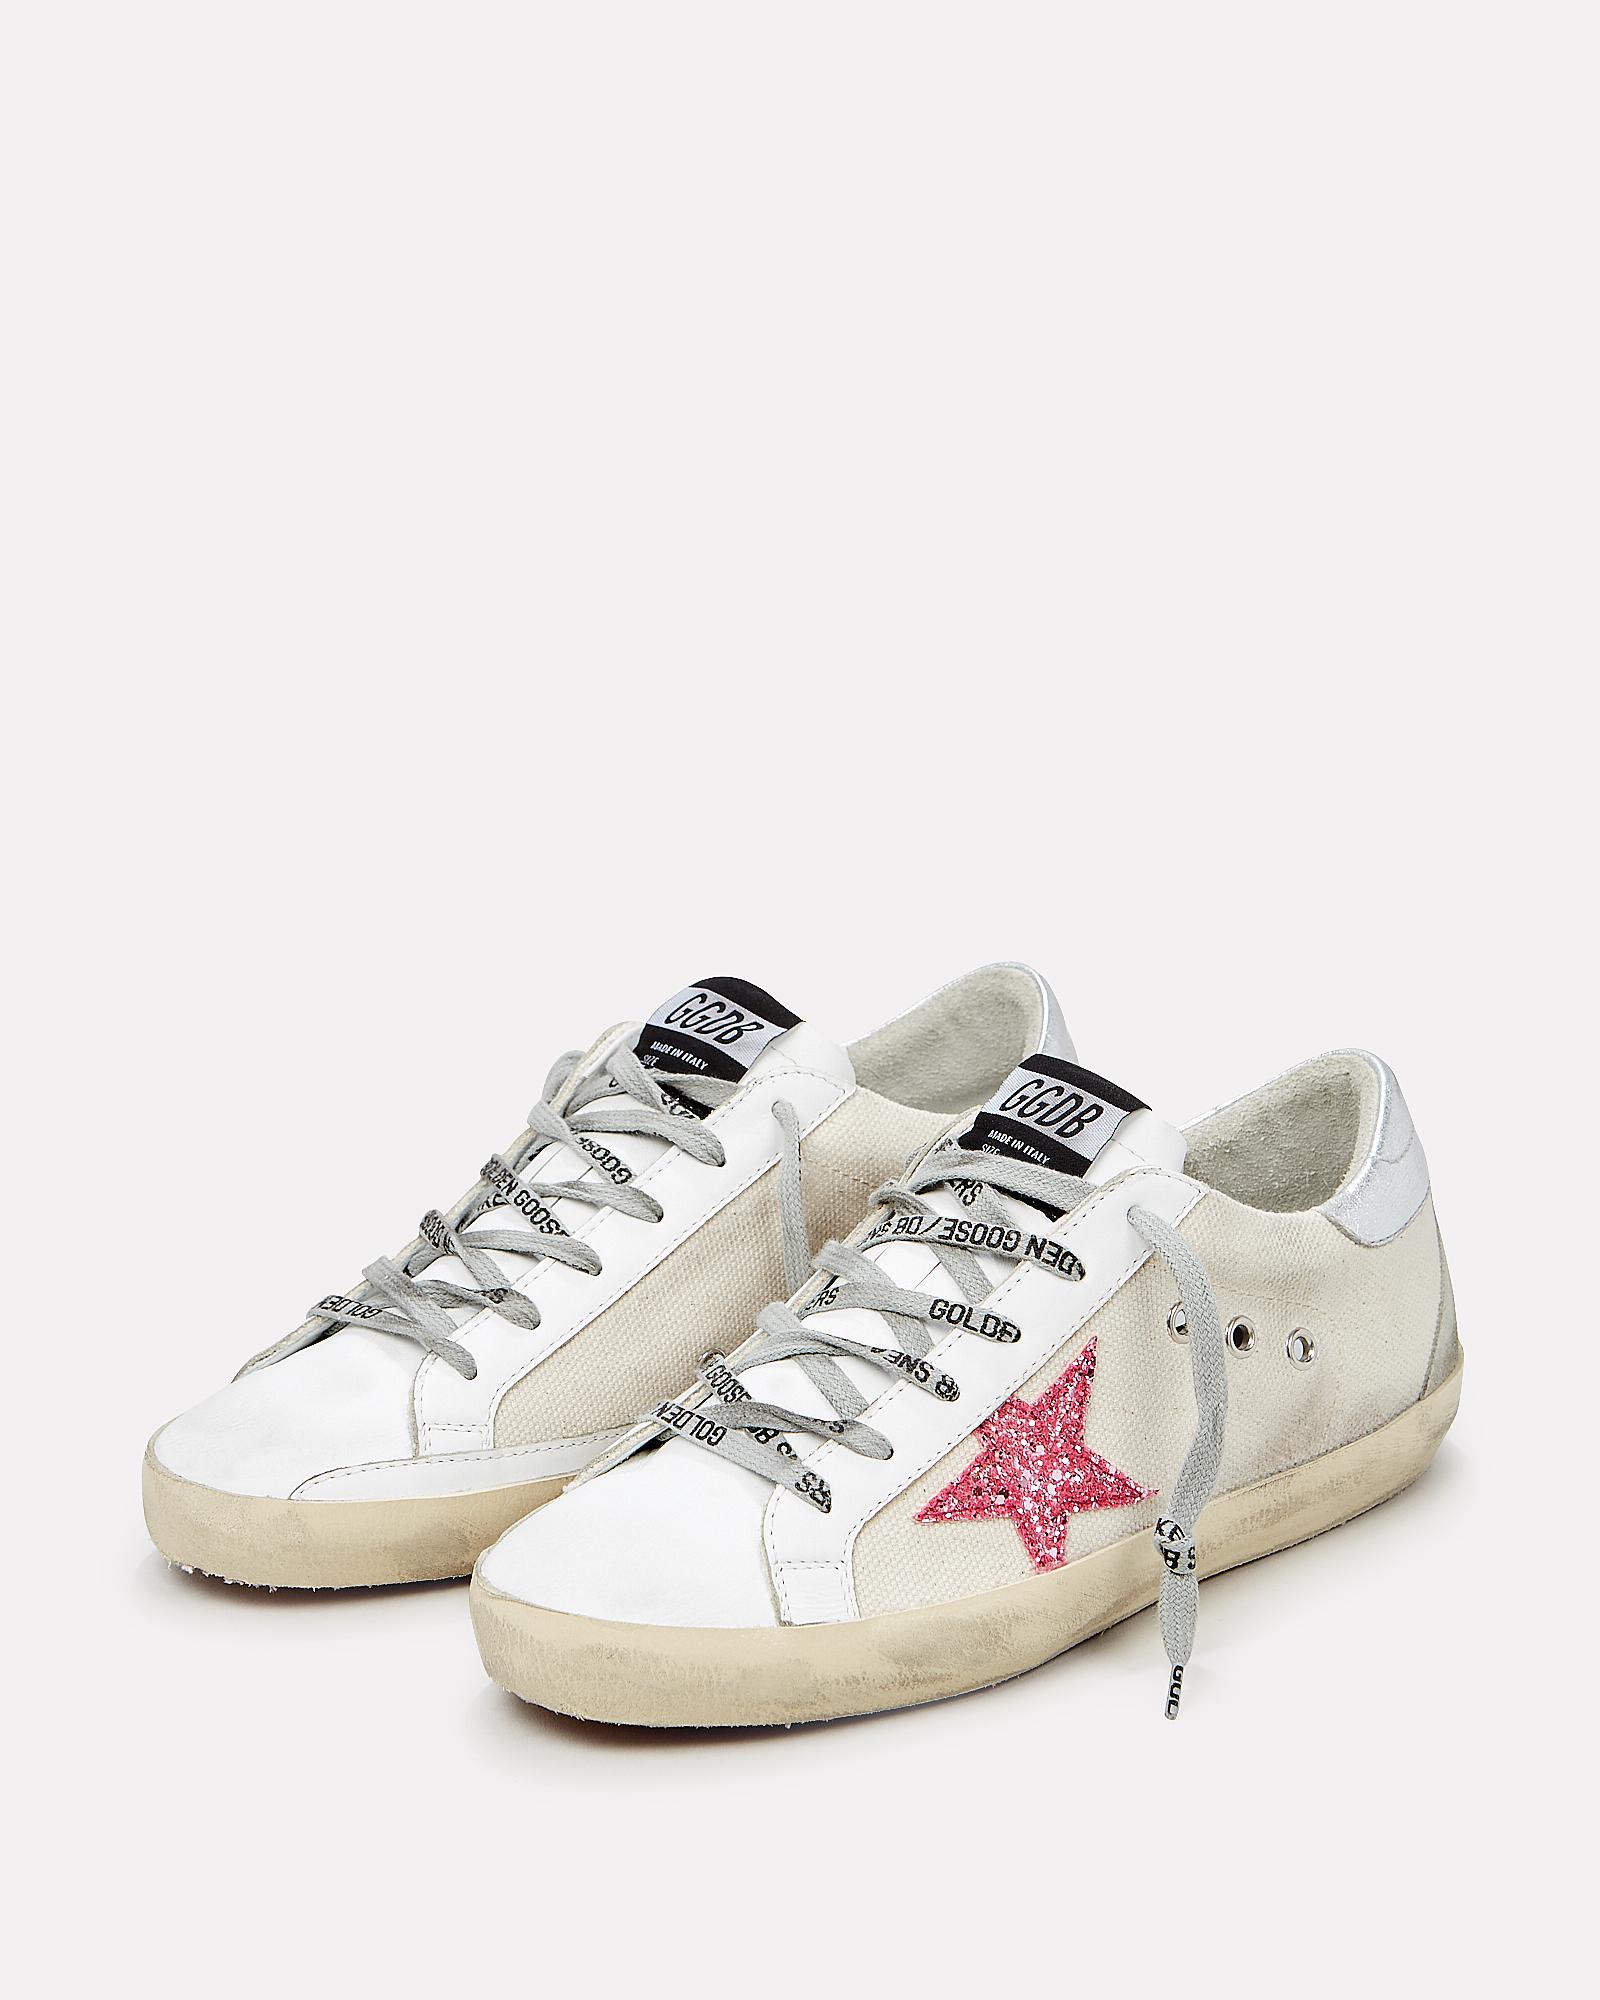 Superstar Pink Glitter Sneakers